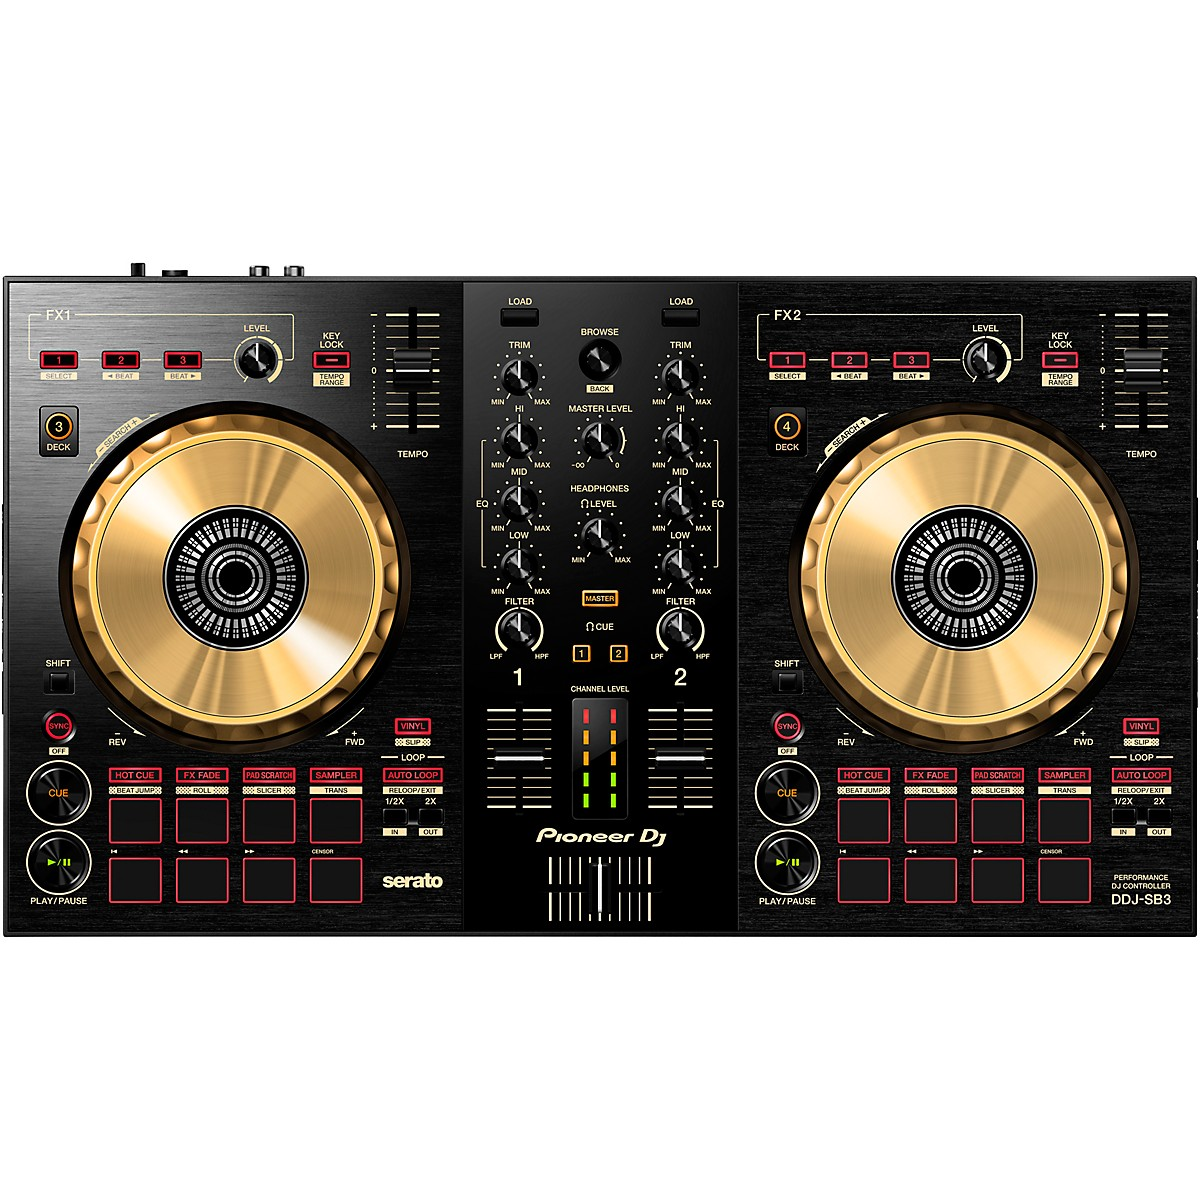 Pioneer DDJ-SB3-N Limited-Edition Gold Serato DJ Controller with Pad Scratch